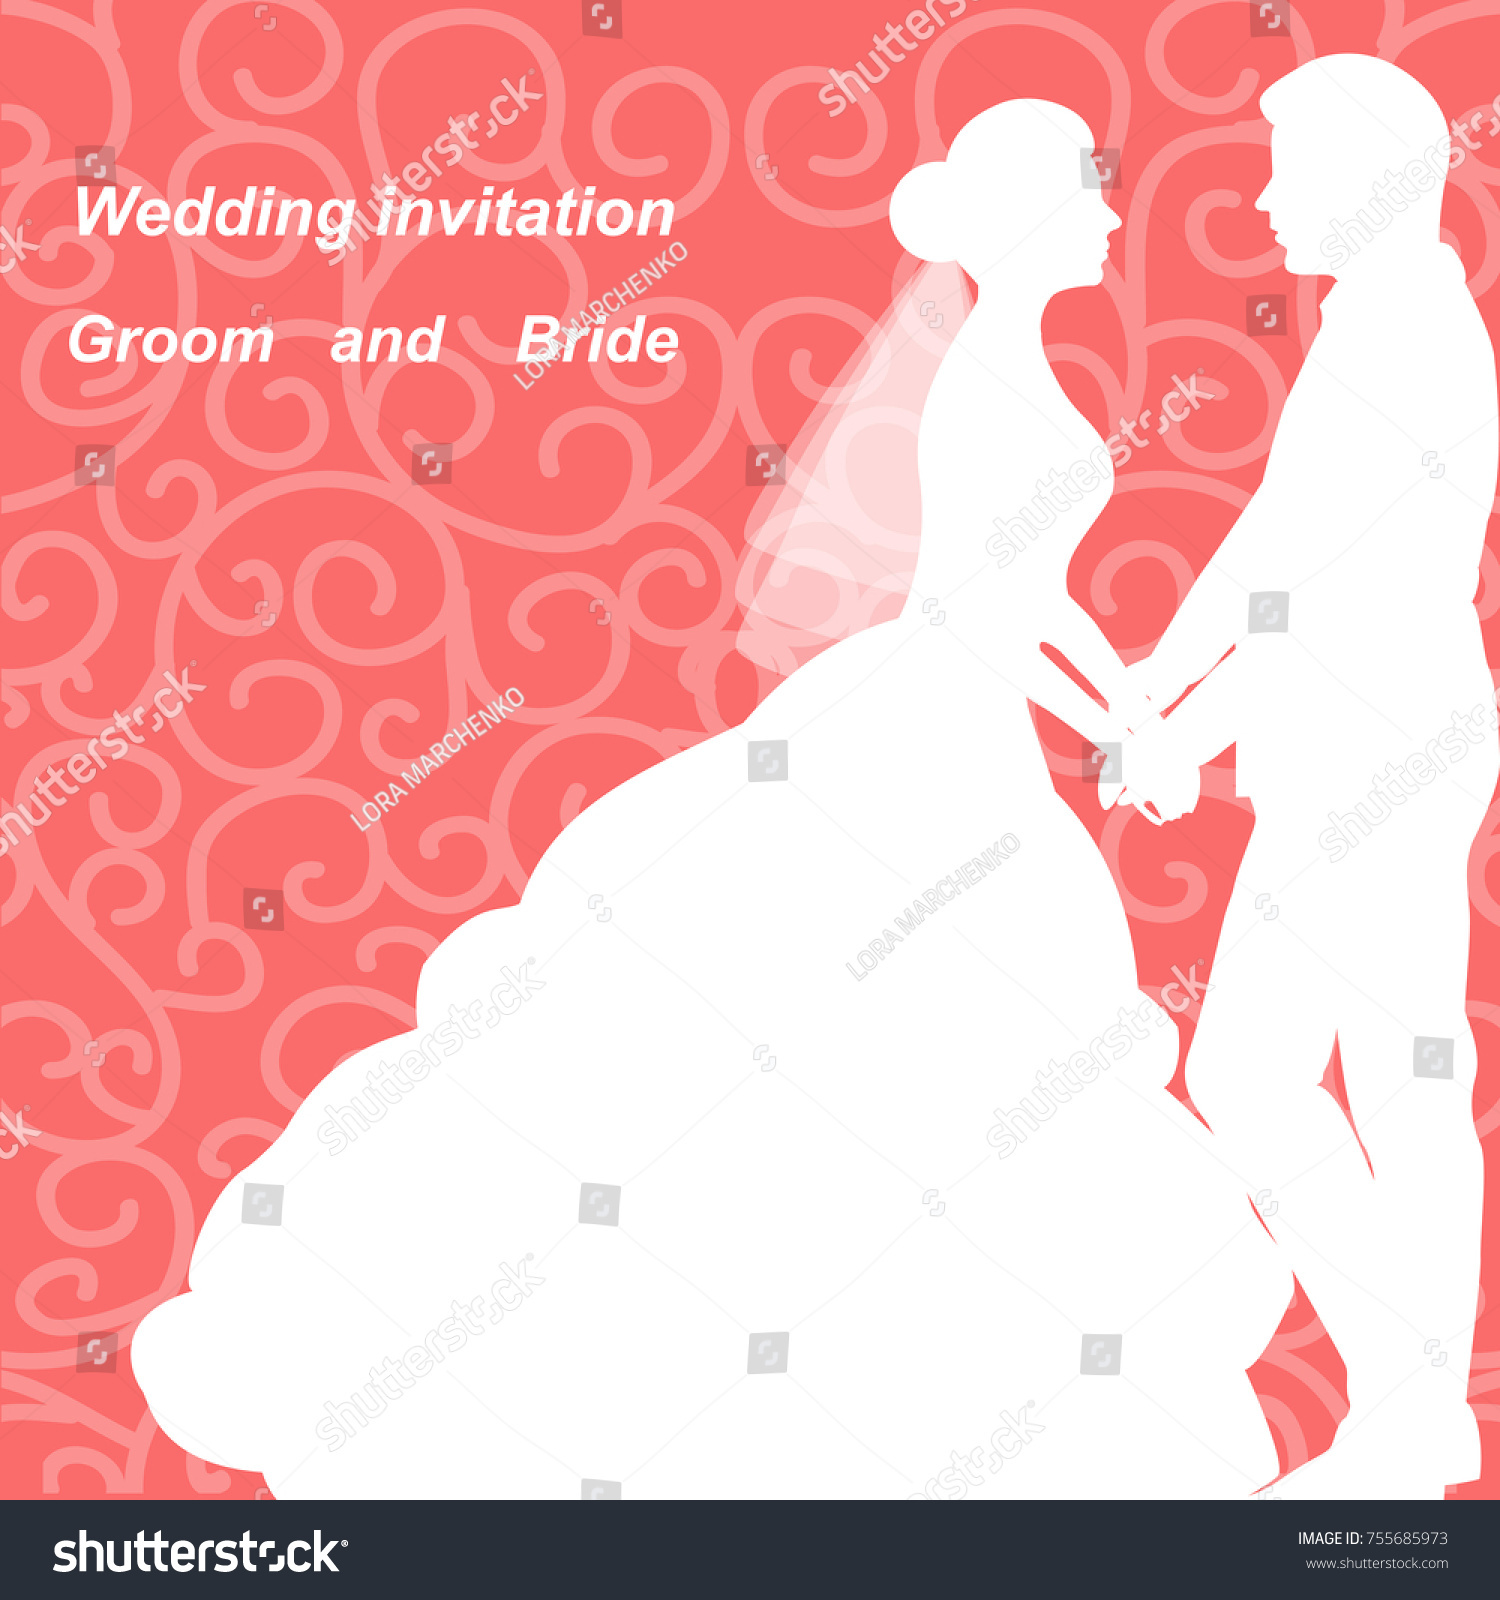 Funky Bride And Groom Wedding Invitation Wording Photo - Invitations ...